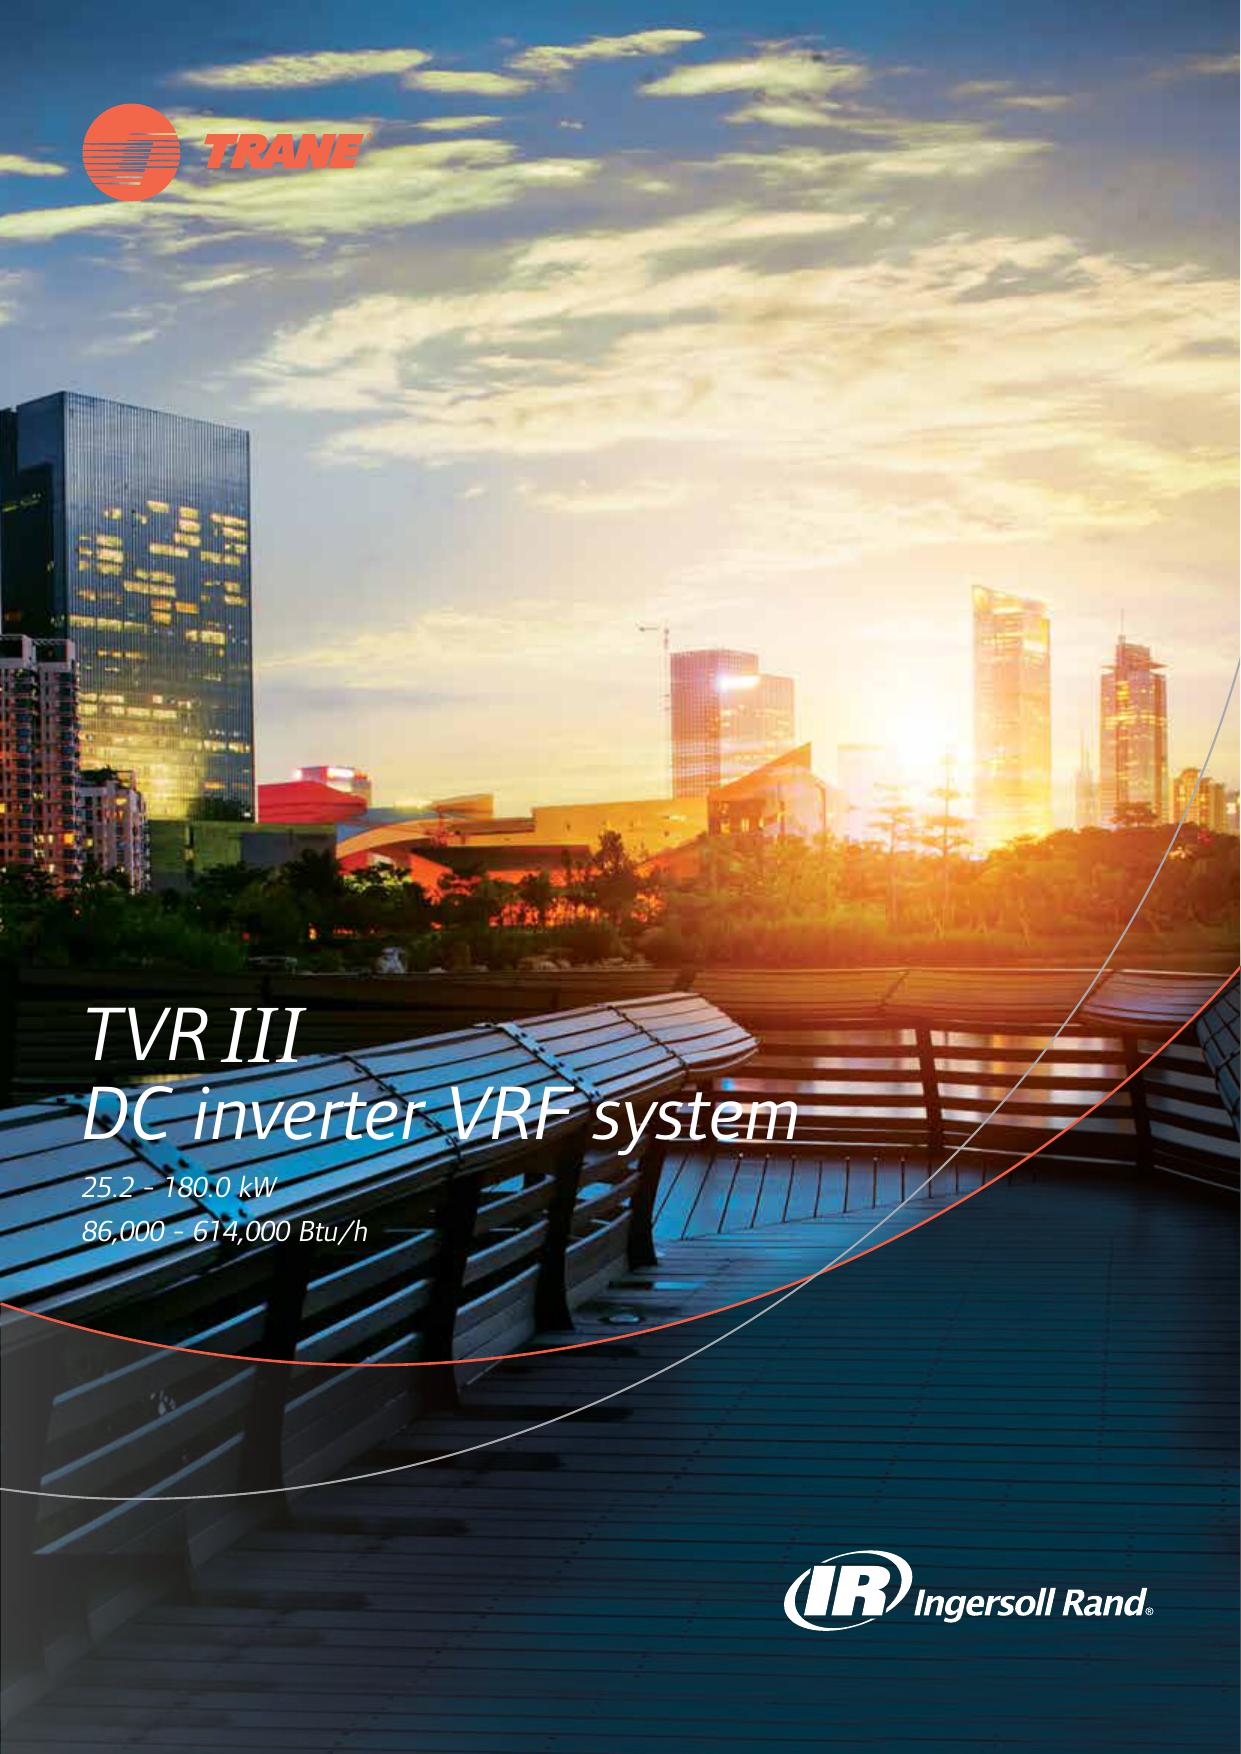 TVRIII DC inverter VRF system | manualzz com